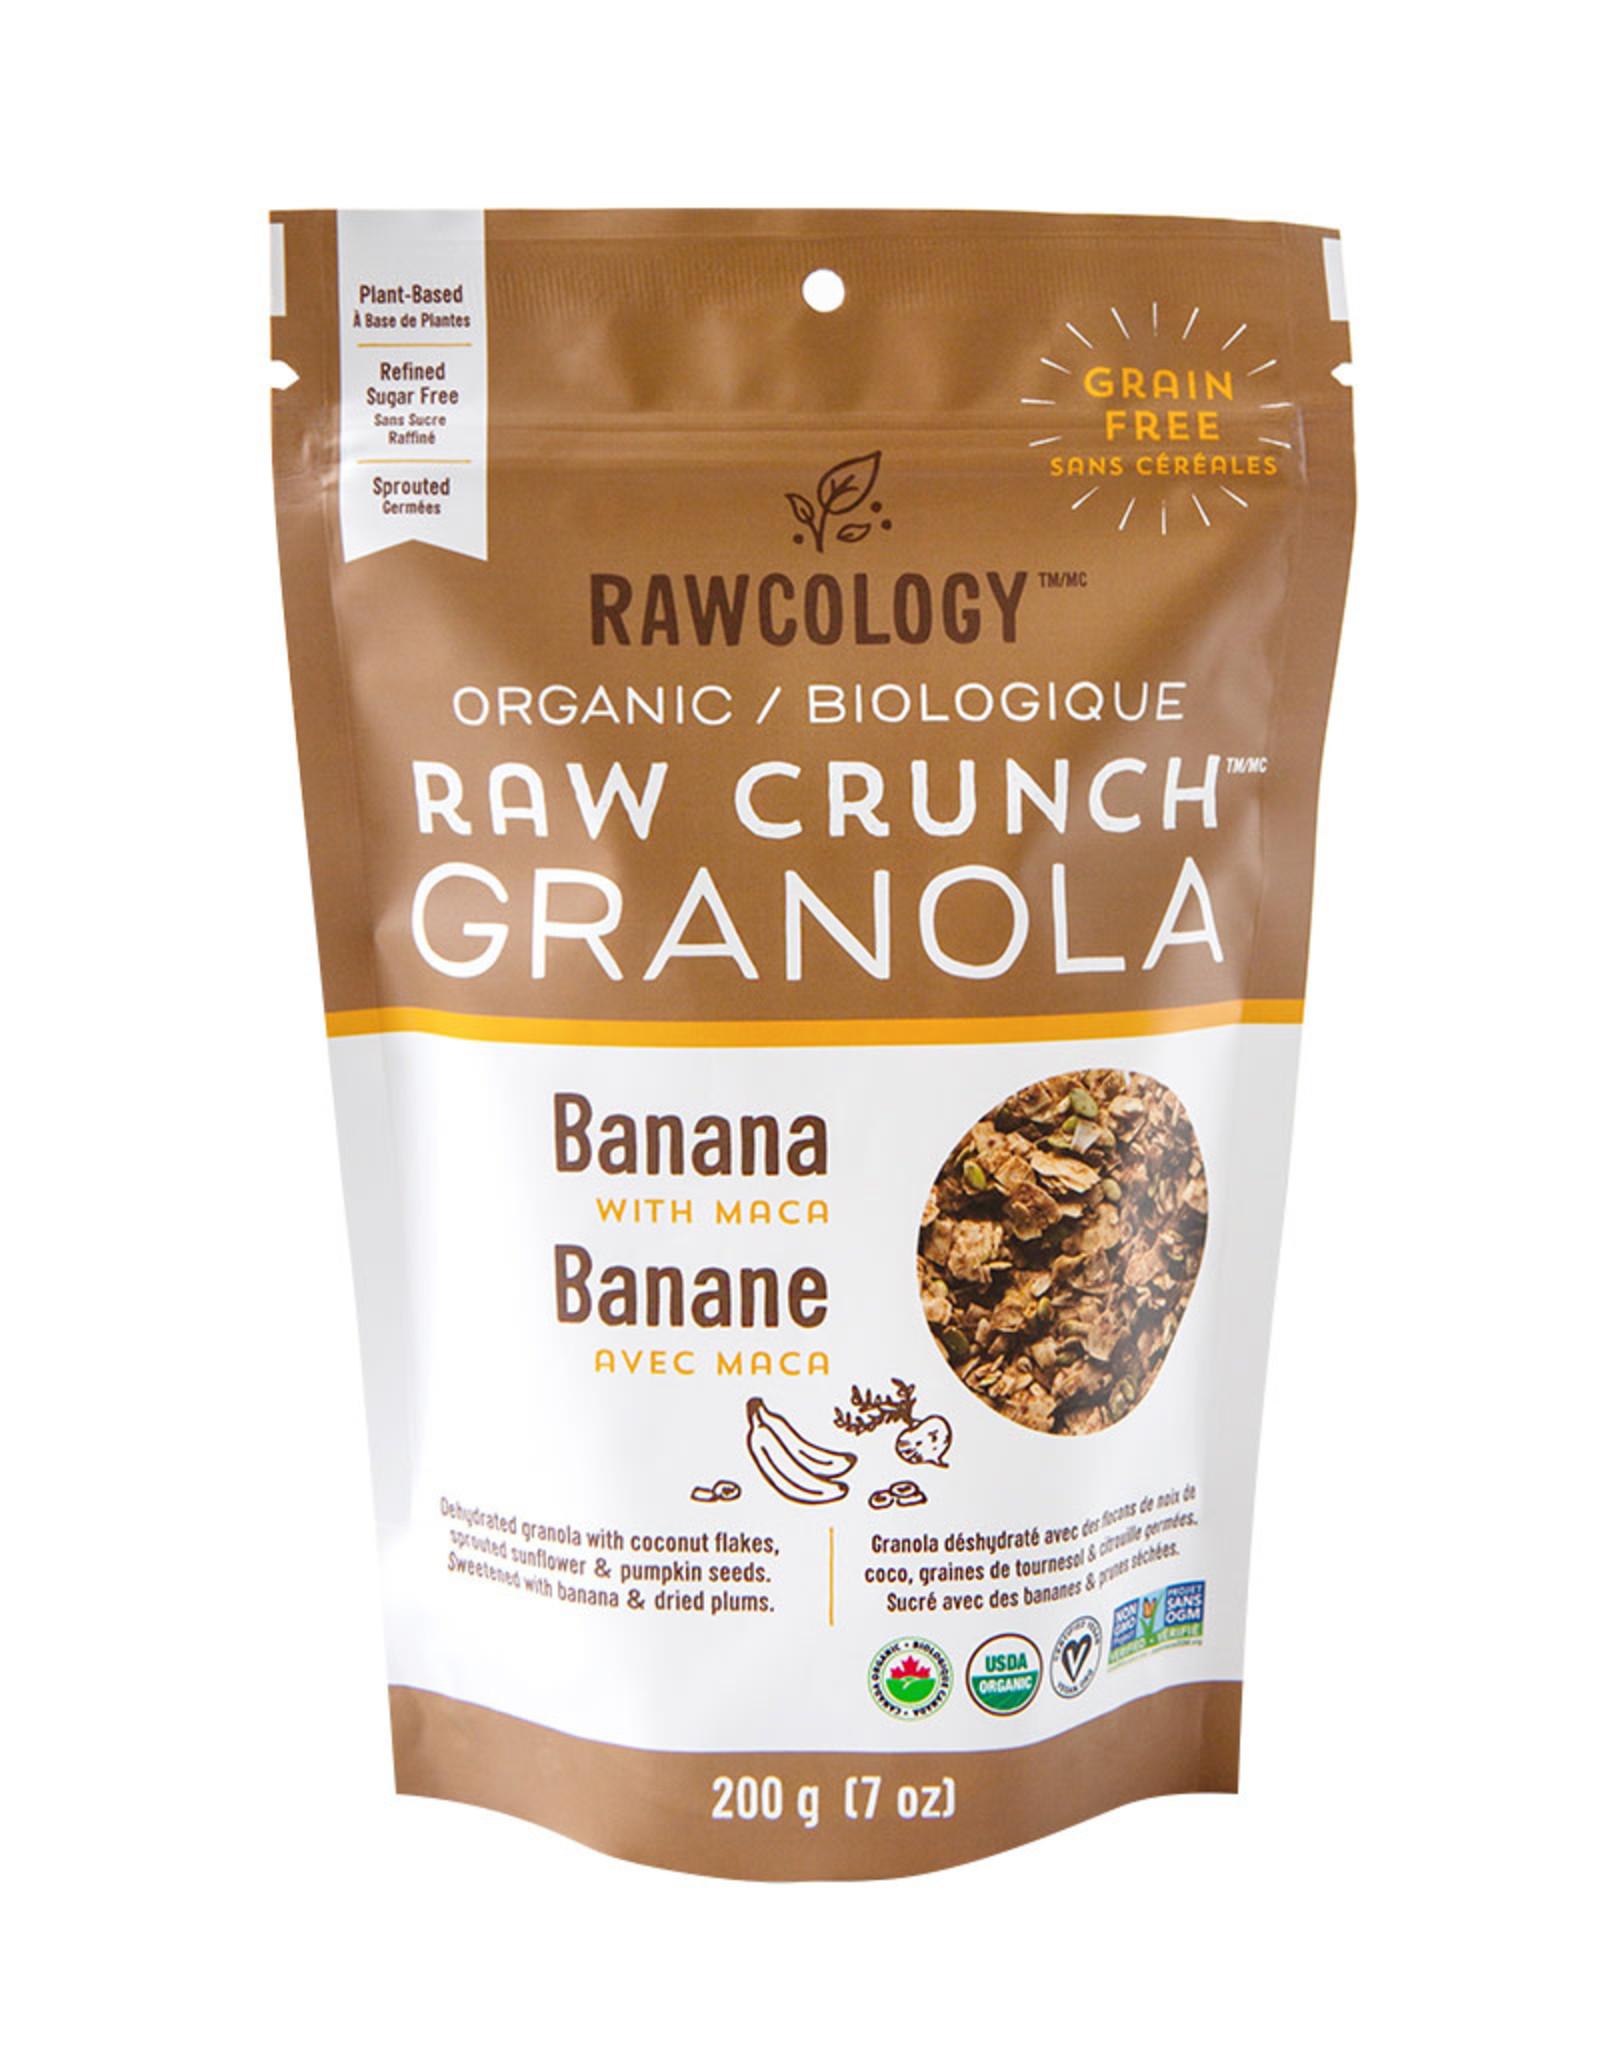 Rawcology Rawcology - Granola, Banana (200g)